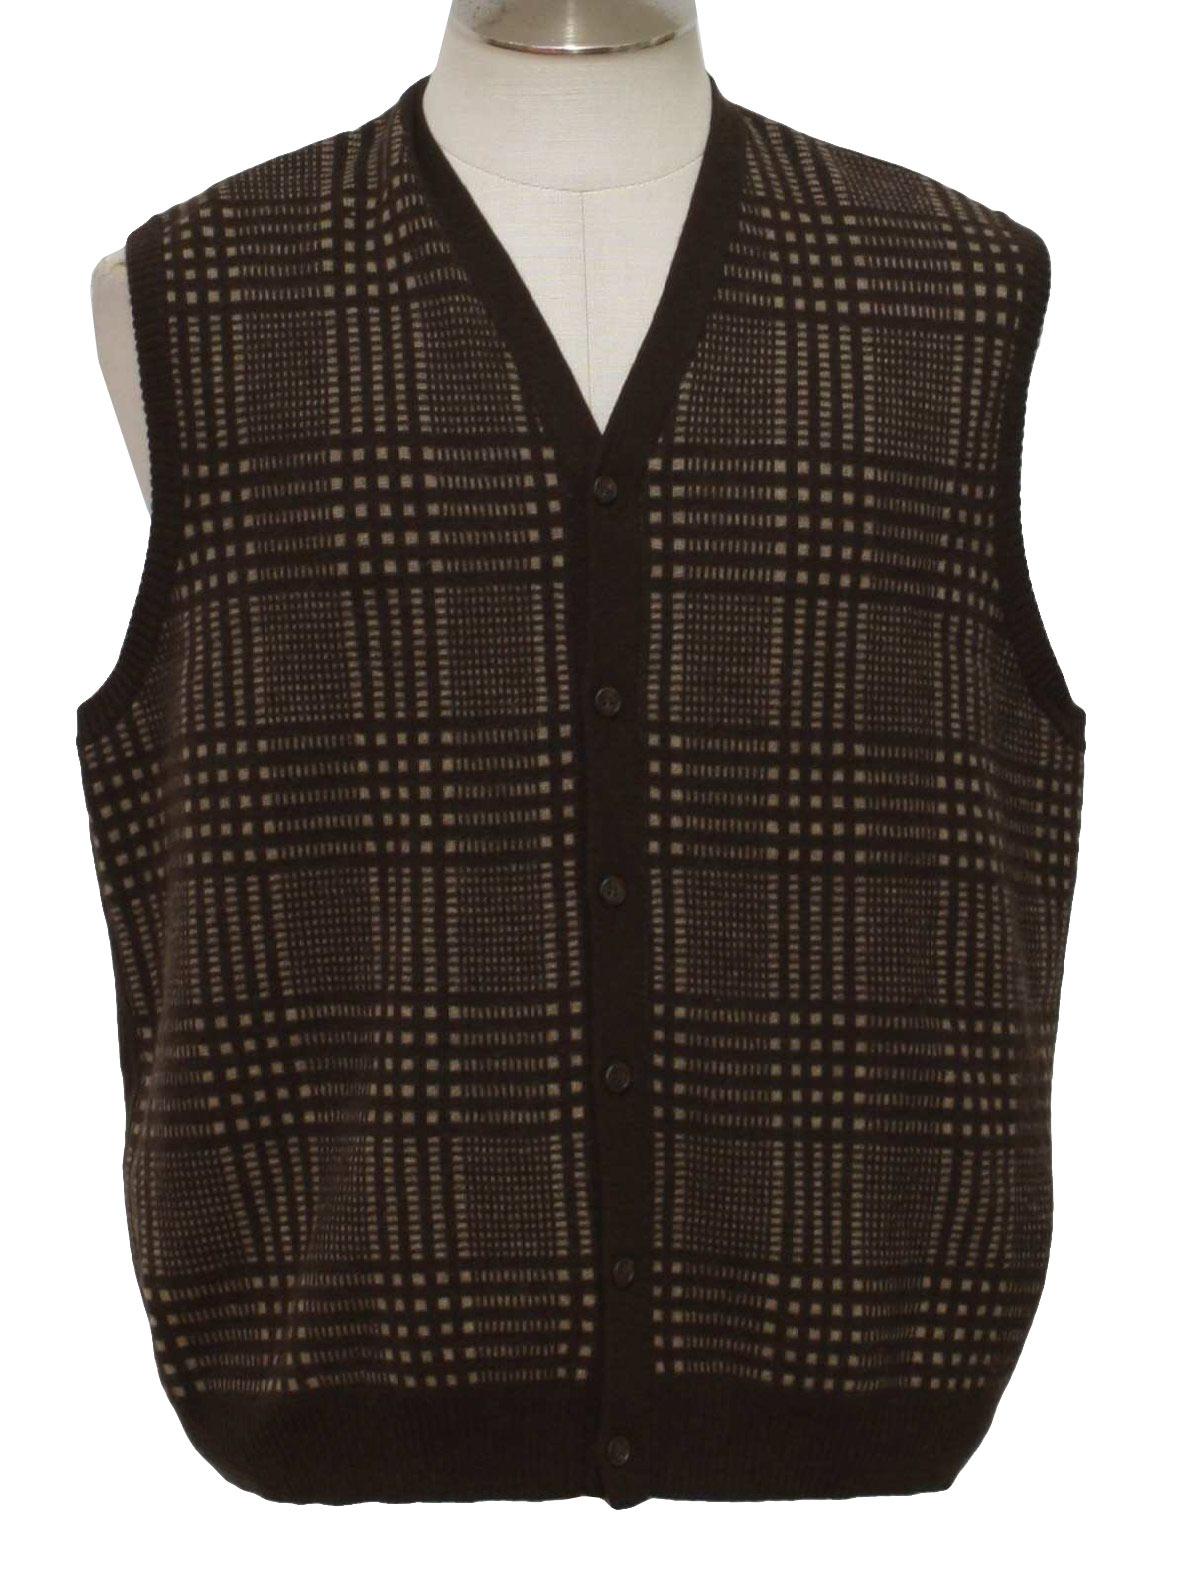 Vintage Pendleton 90's Sweater: 90s -Pendleton- Mens brown and tan ...